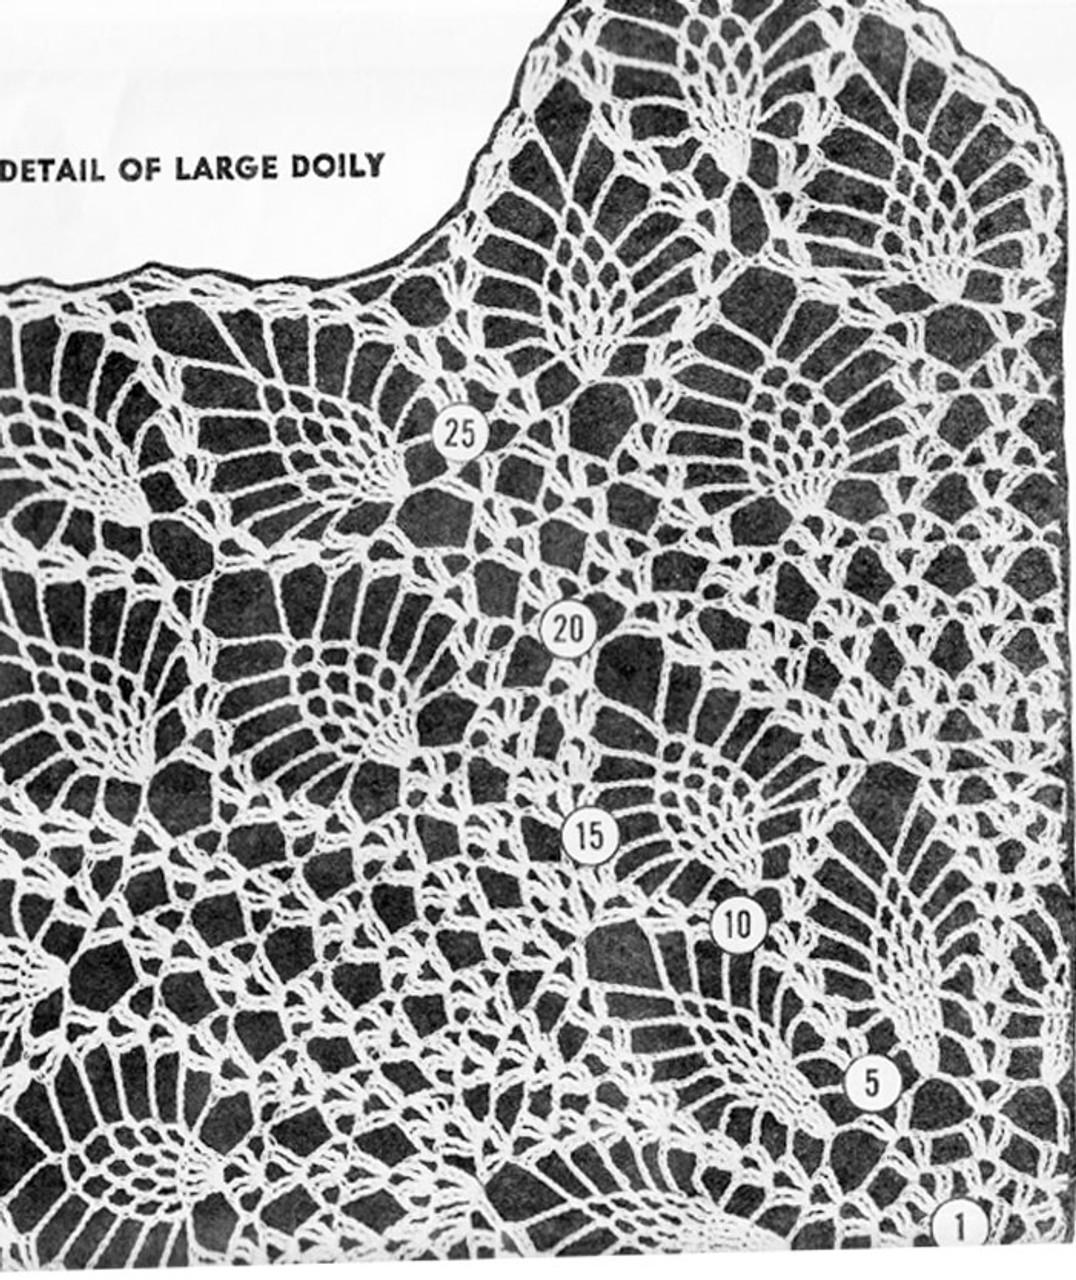 Centerpiece Doily Pattern Illustration, Design 619